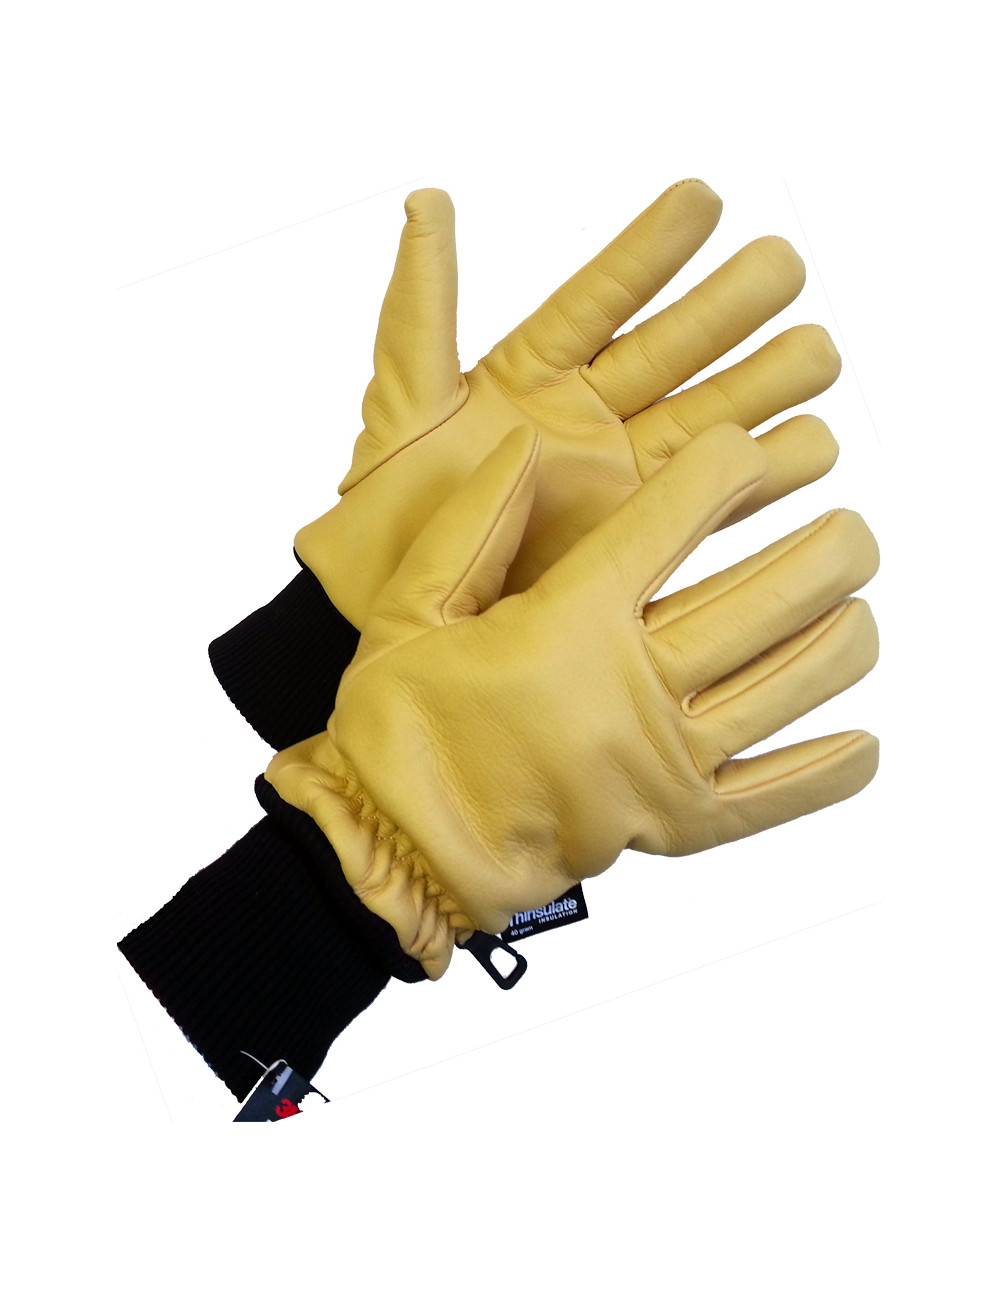 Order Picker Coldstore Glove